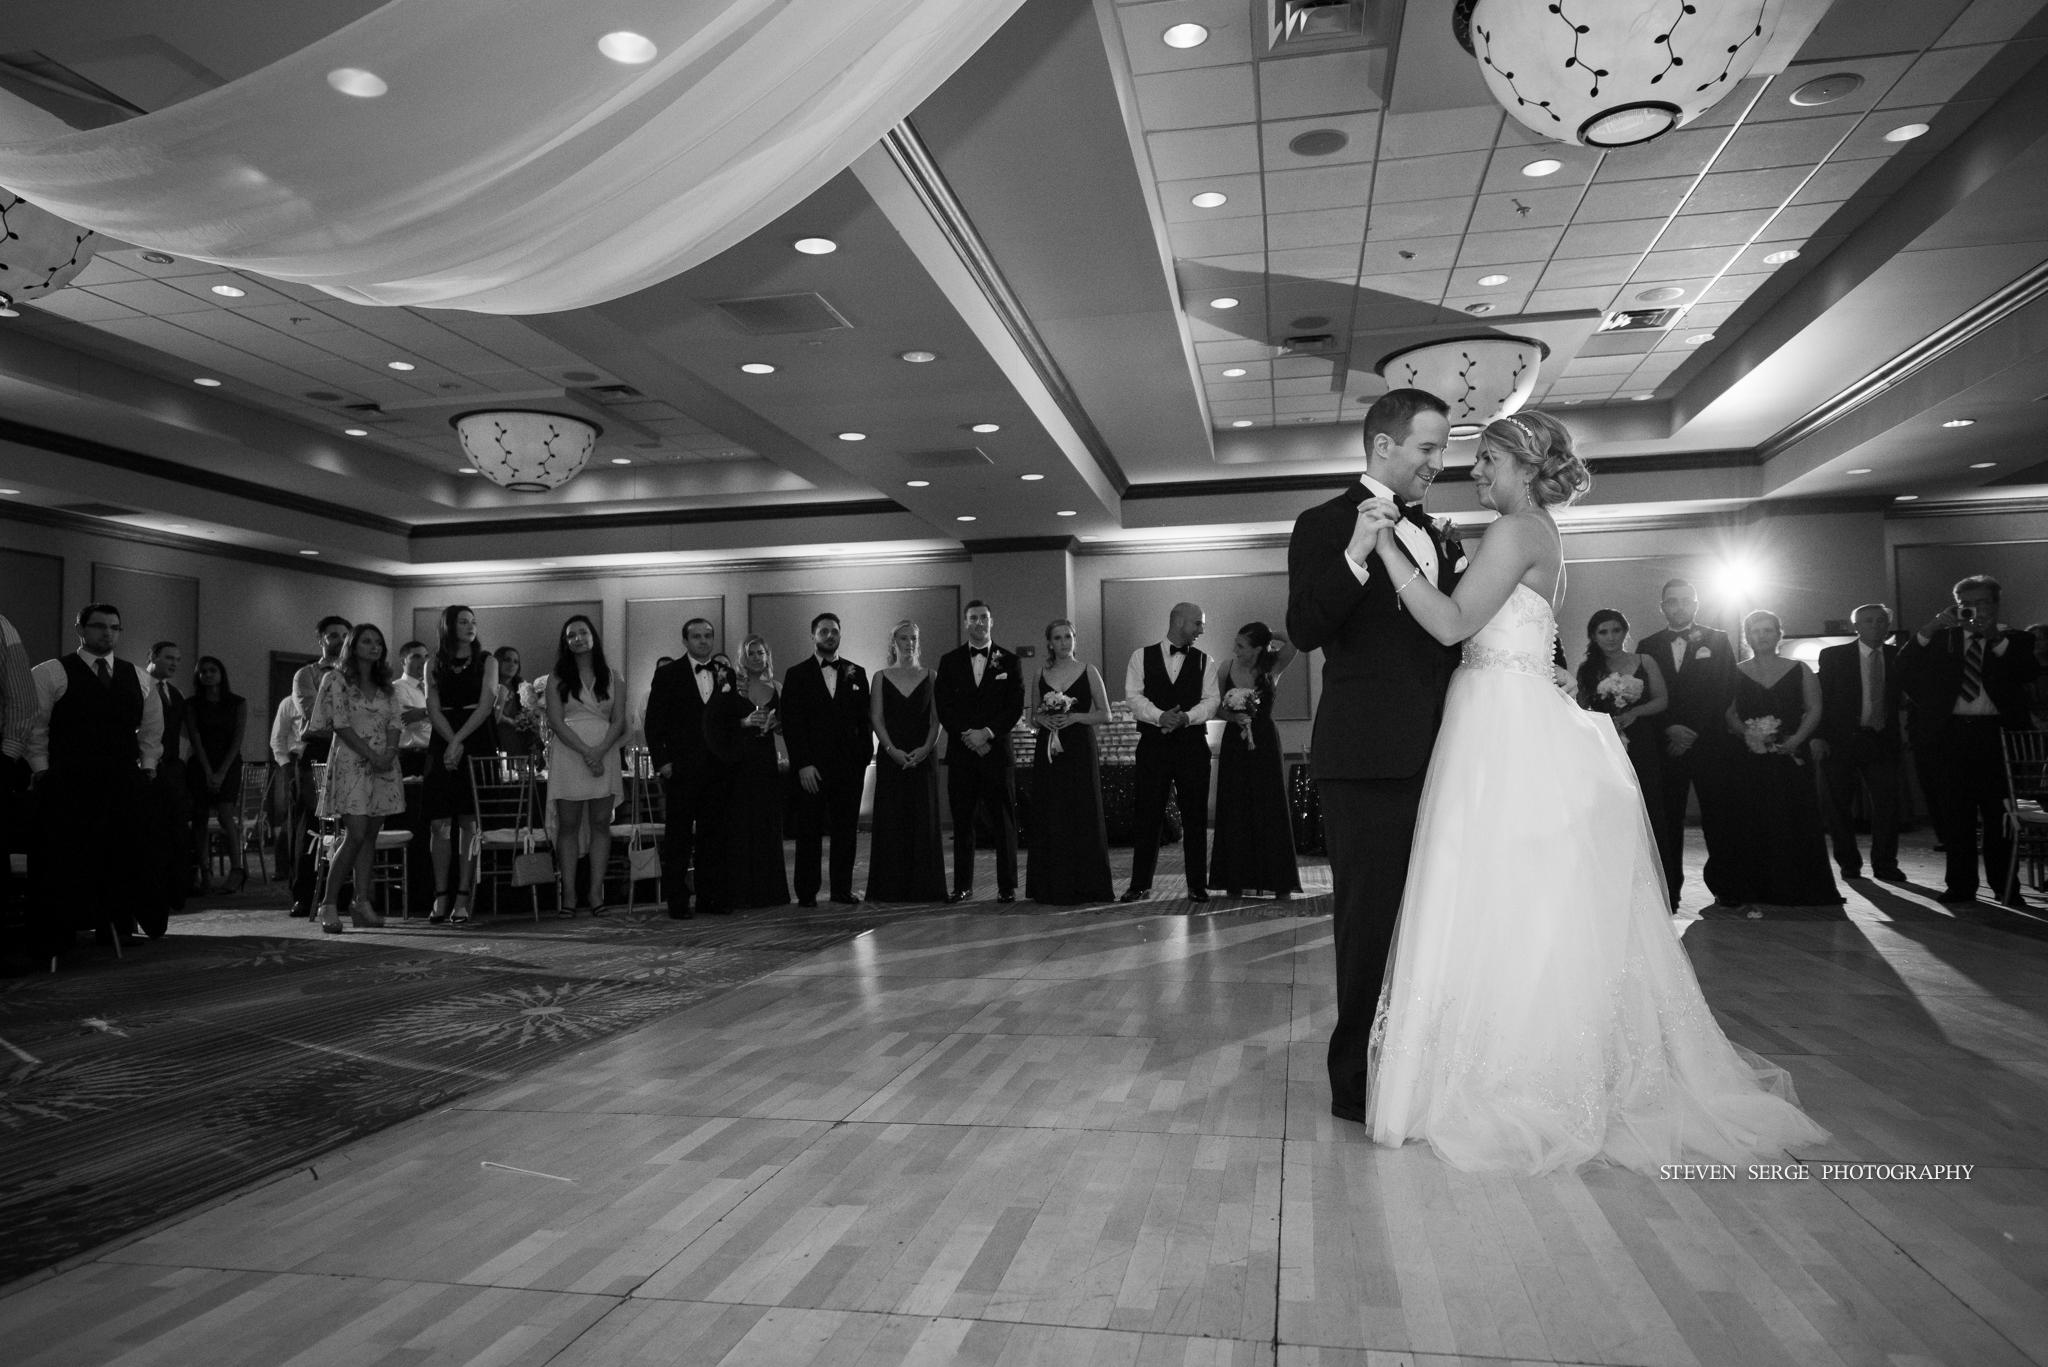 scranton-wedding-photographers-hilton-steven-serge-photography-14.jpg